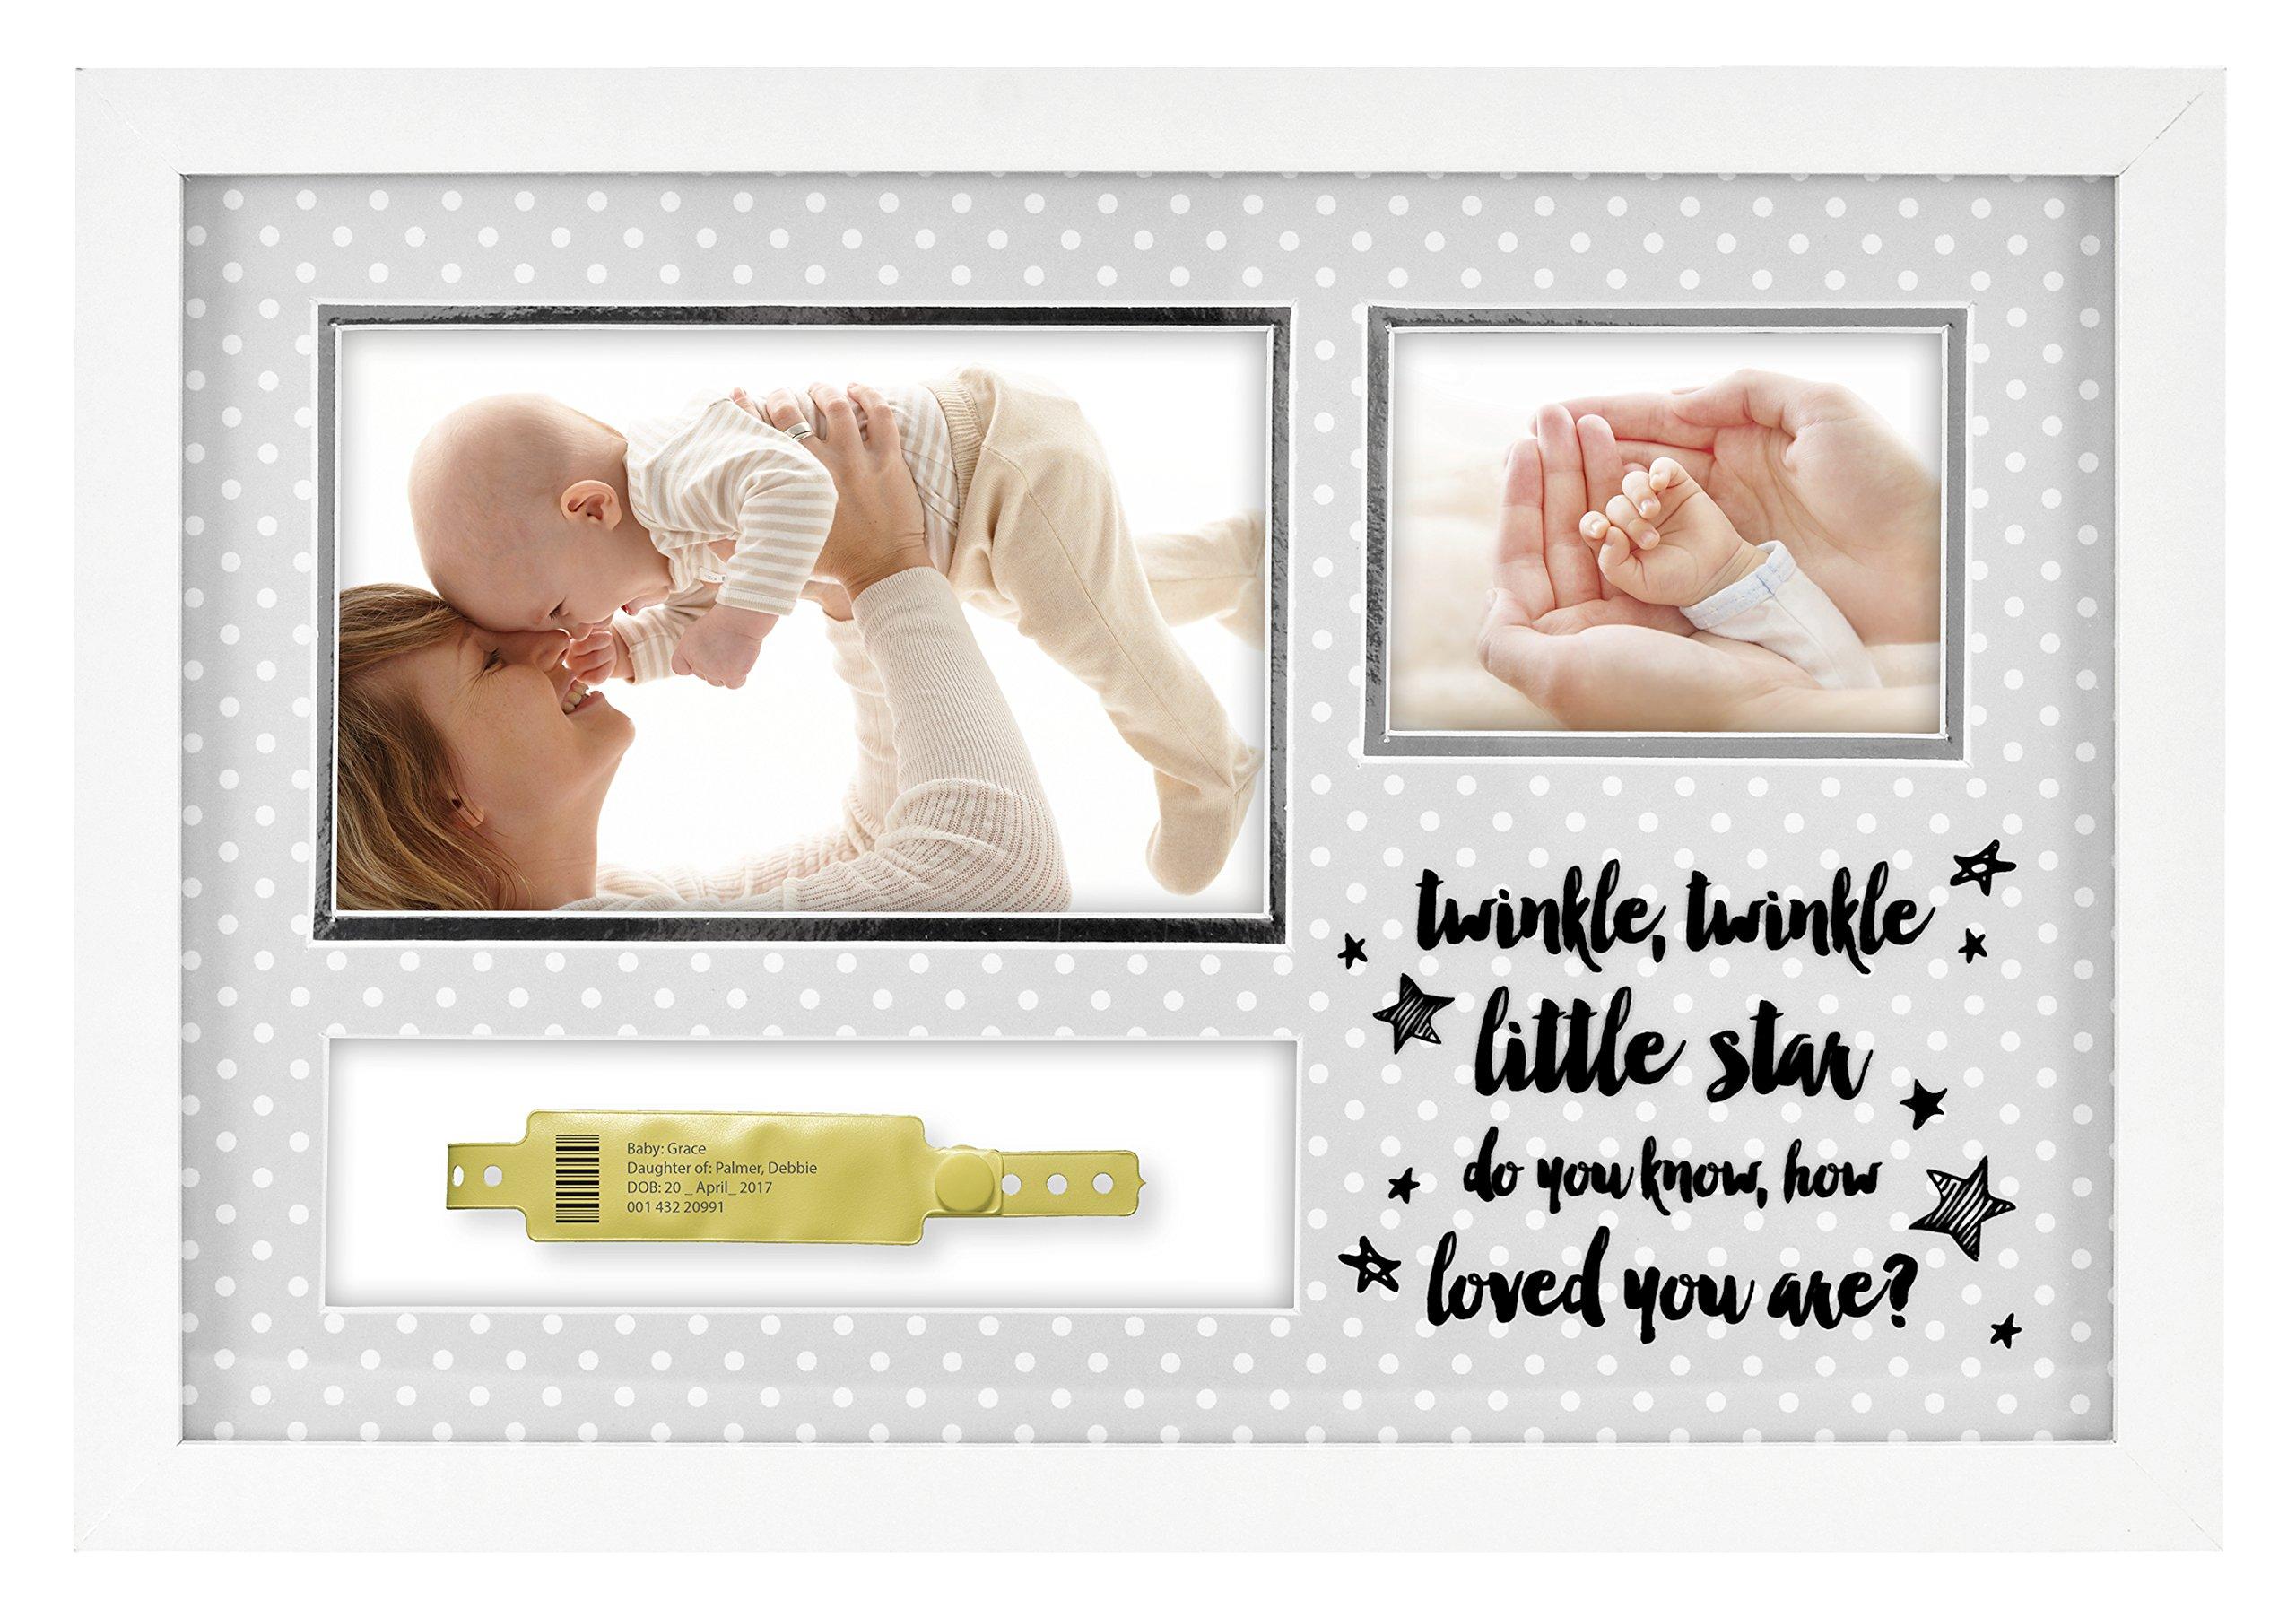 MCS ''Twinkle, Twinkle Little Star Baby Hospital ID Bracelet and Photo Frame (66890)